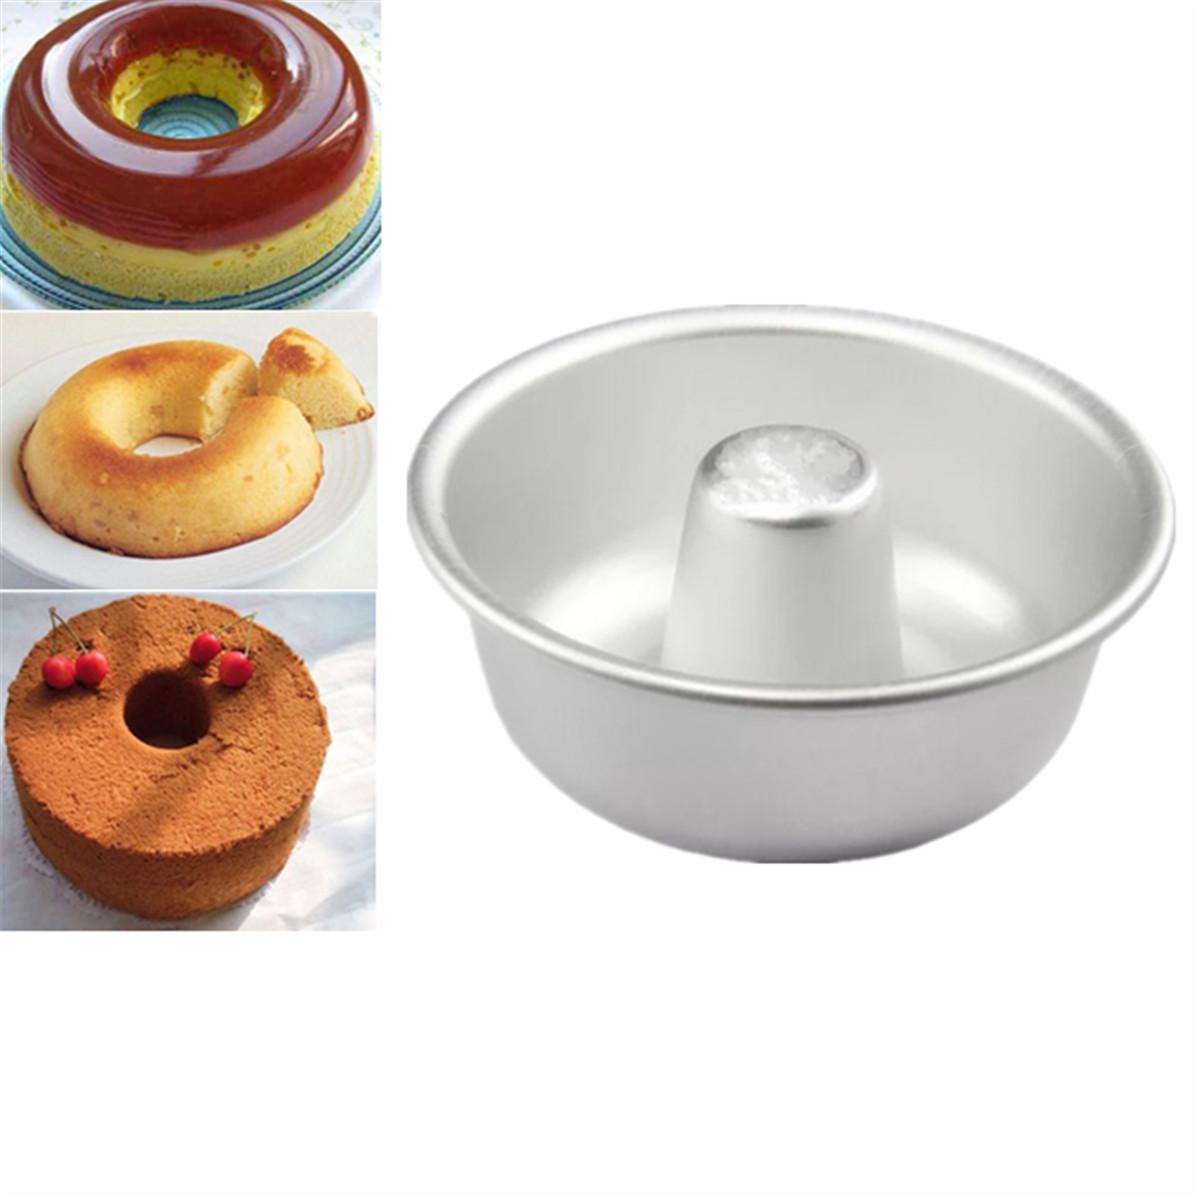 Chiffon Cake Mold Diy Donut Pan Mould Baking Tin Ring